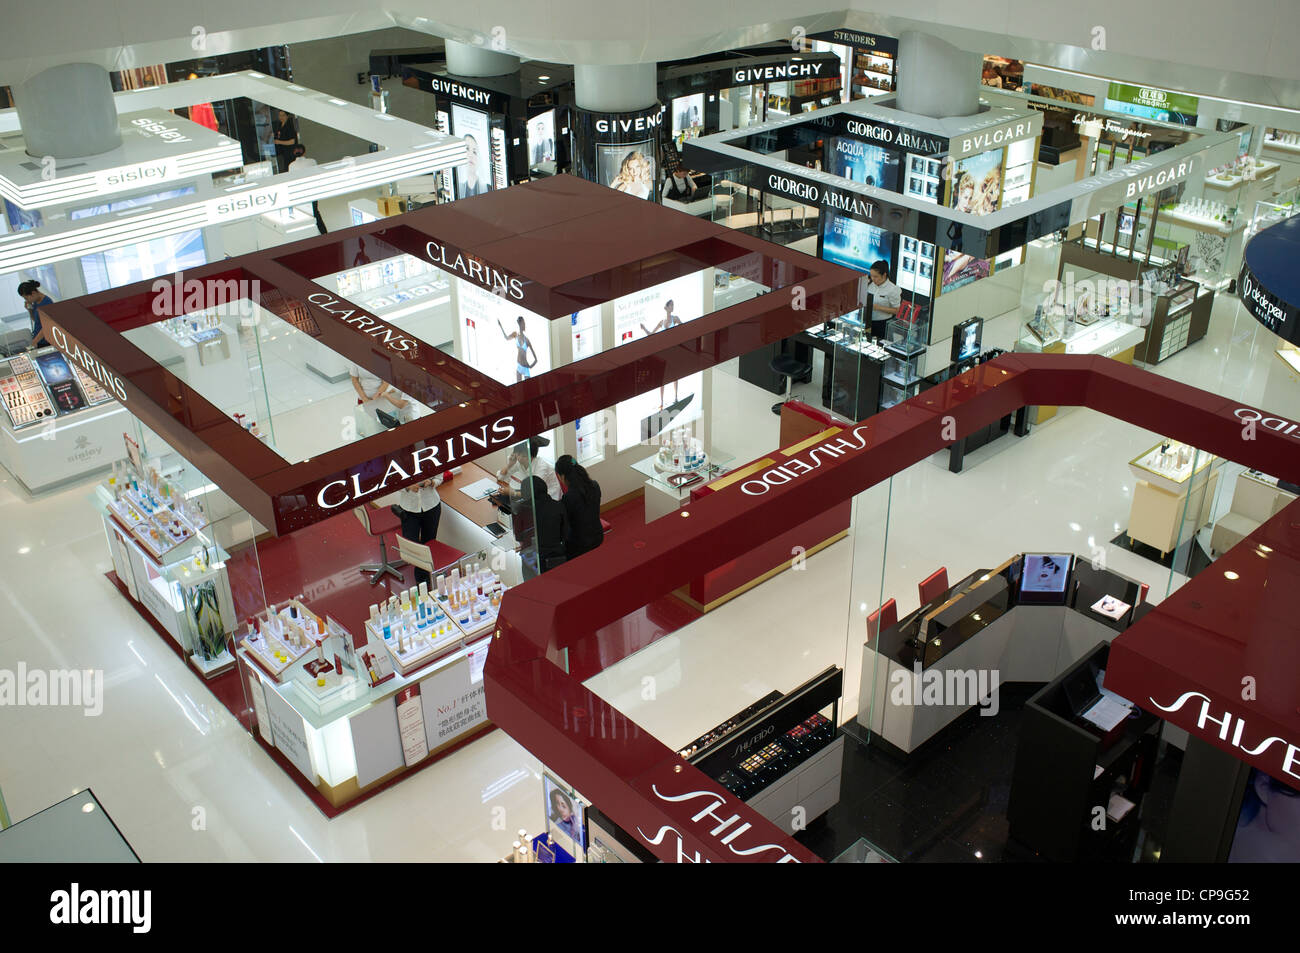 Kosmetik-Abschnitt im Freundschaft Department Store, die erste High-End-Luxus-Kaufhaus in Tianjin, China. 7. Mai Stockbild